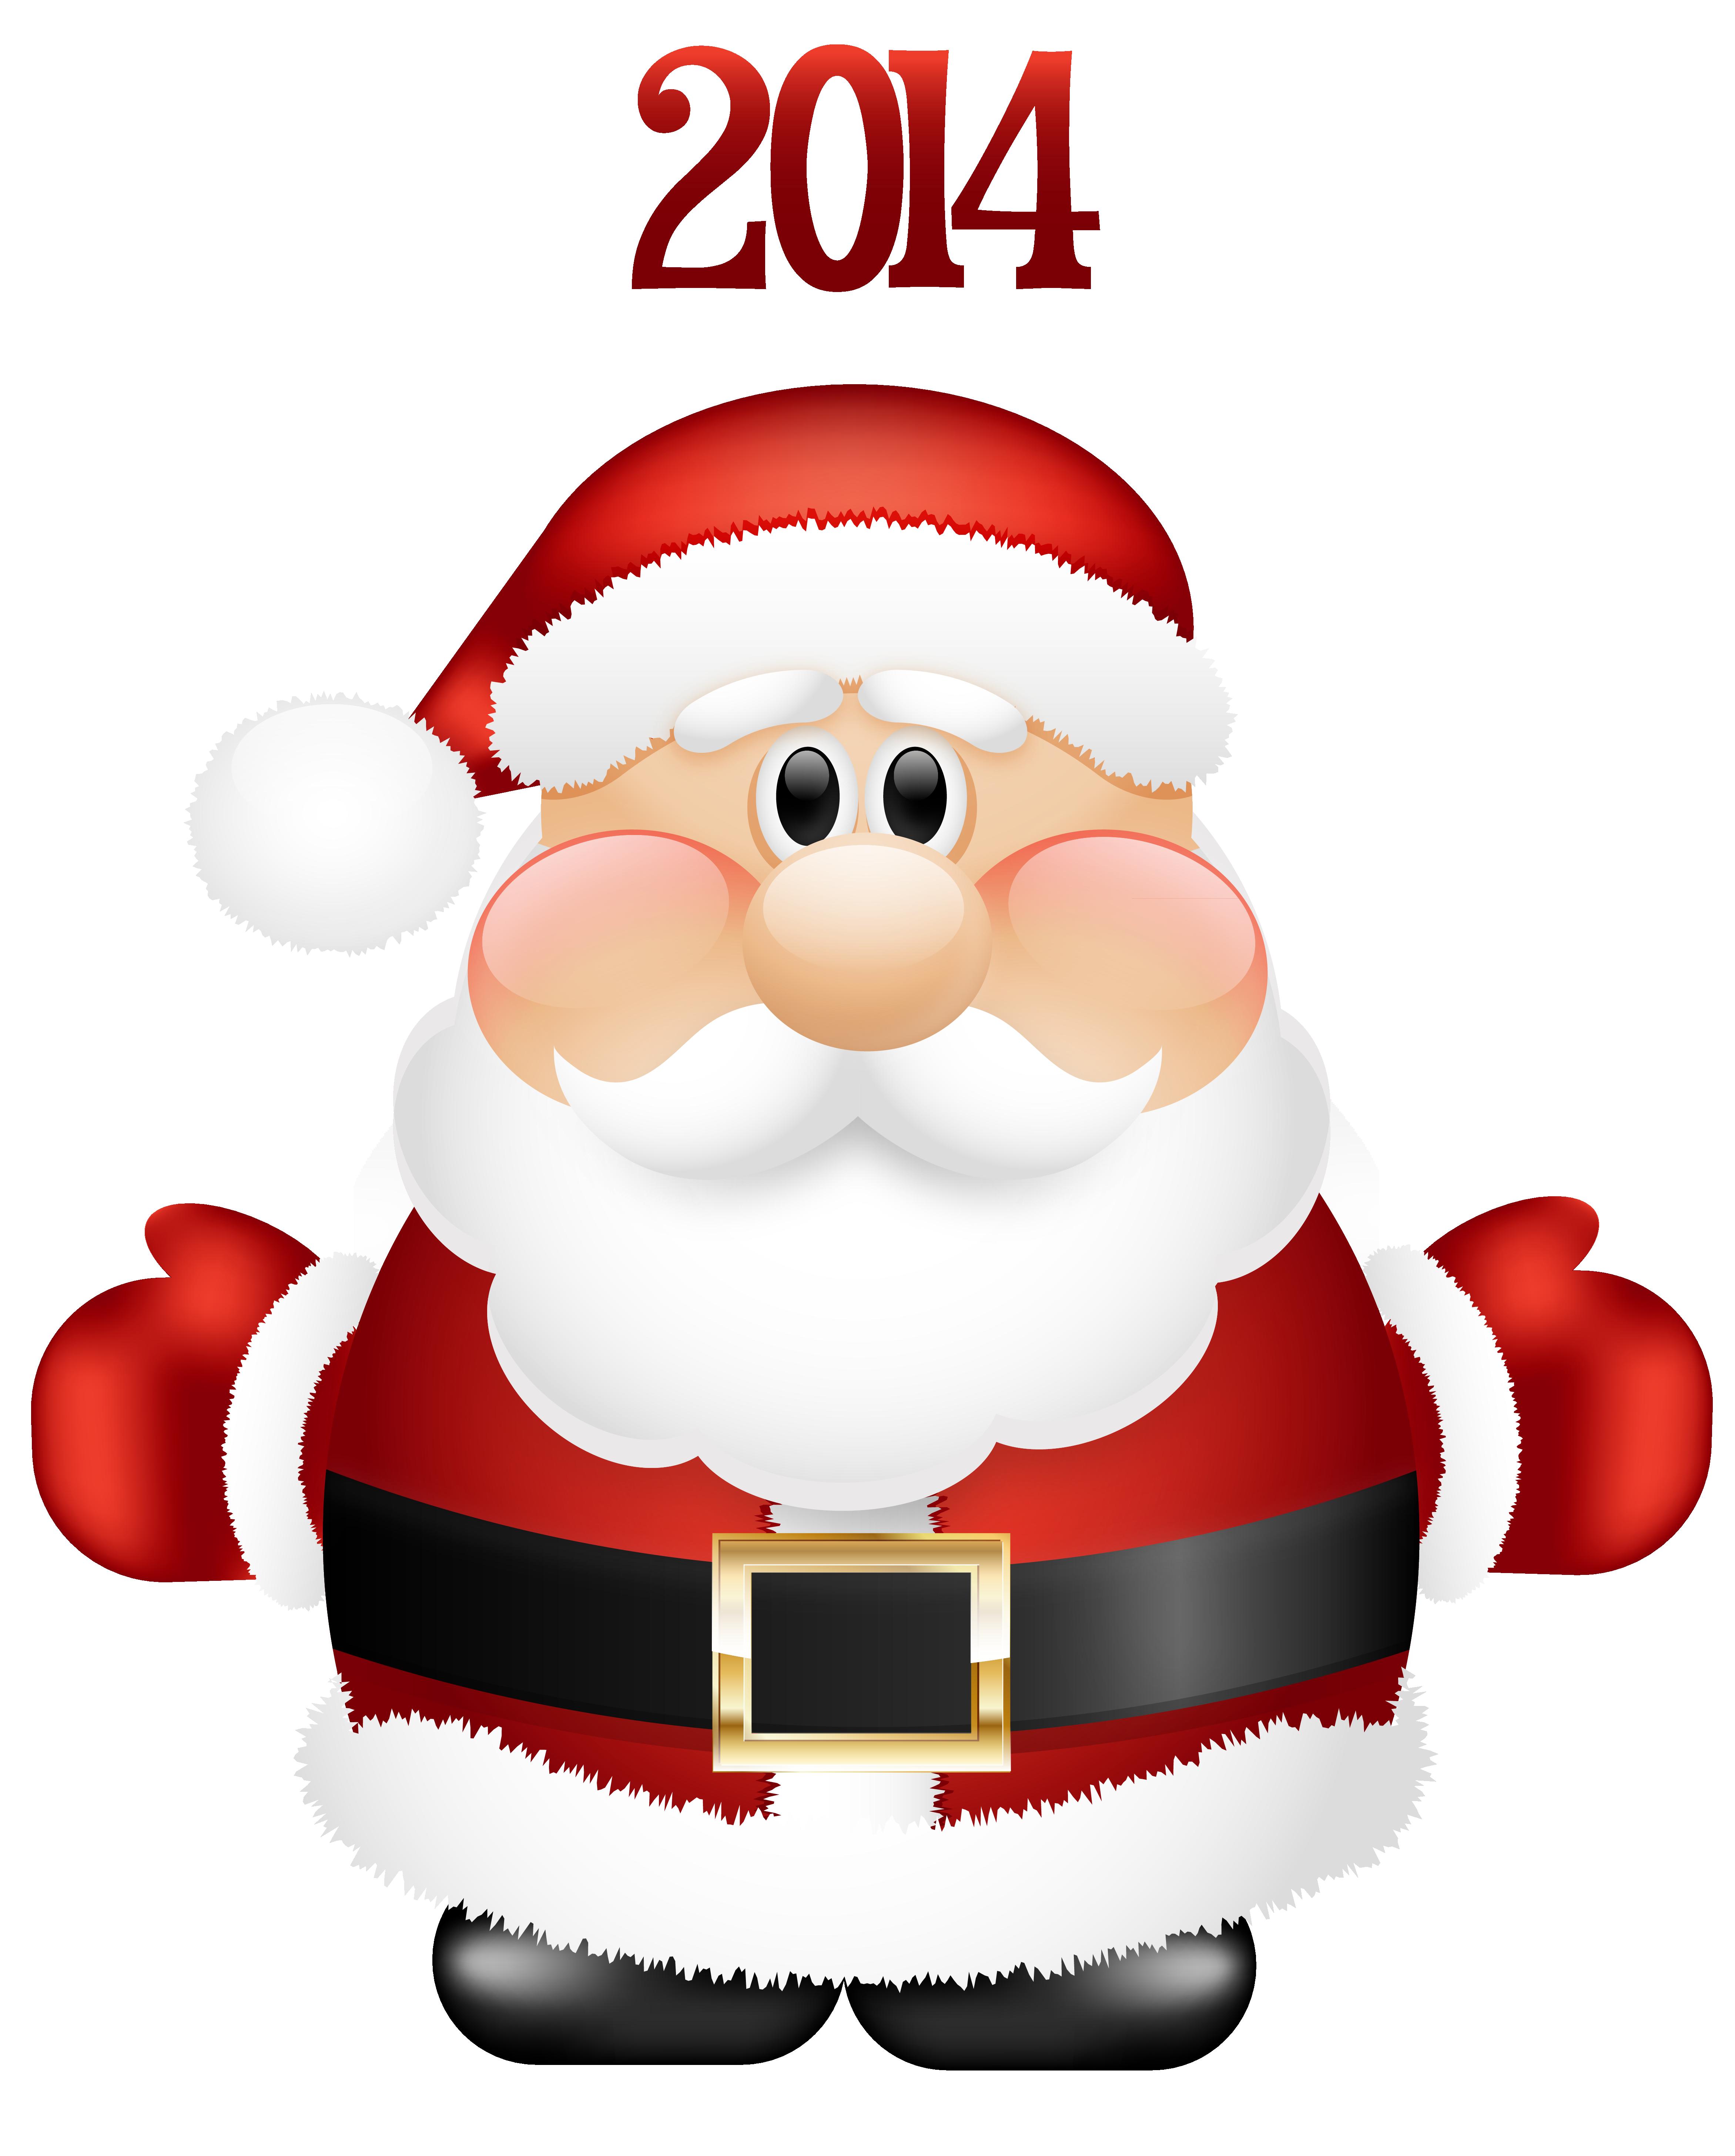 Transparent Cute Santa Claus 2014 PNG Clipart.